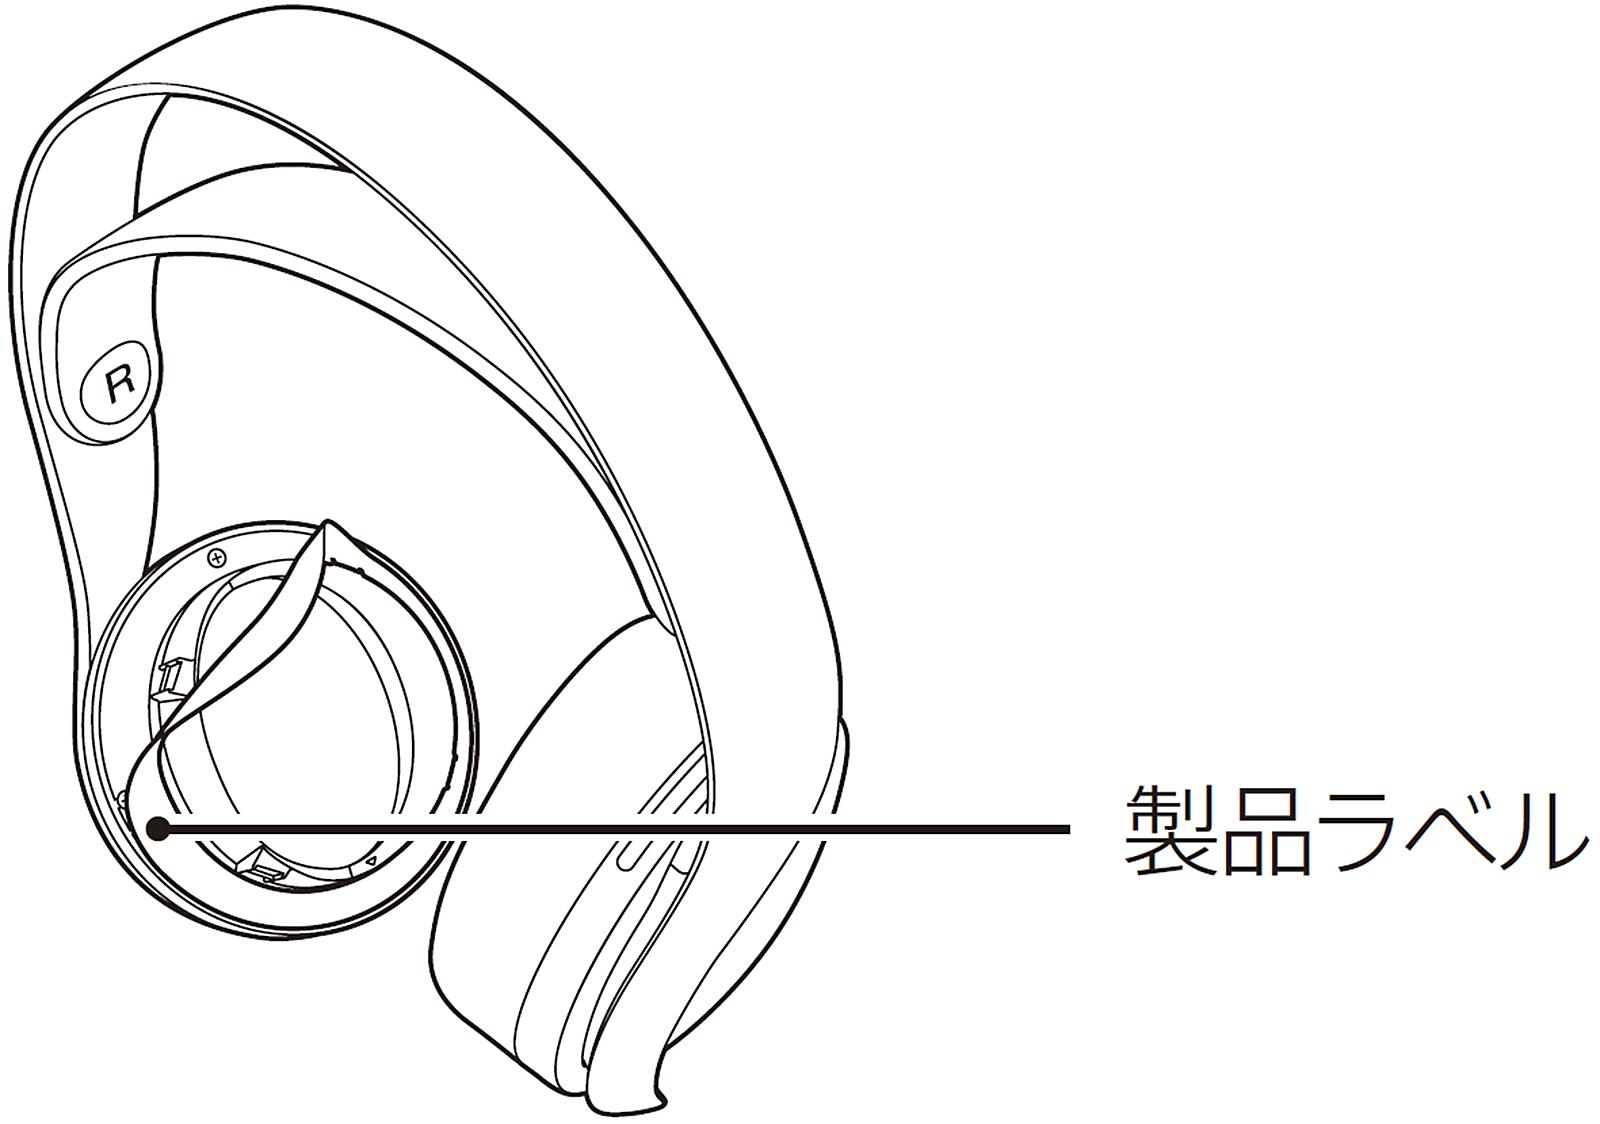 CFI-ZWH1J-image-block-remove-battery-01-ja-jp-28apr21.png